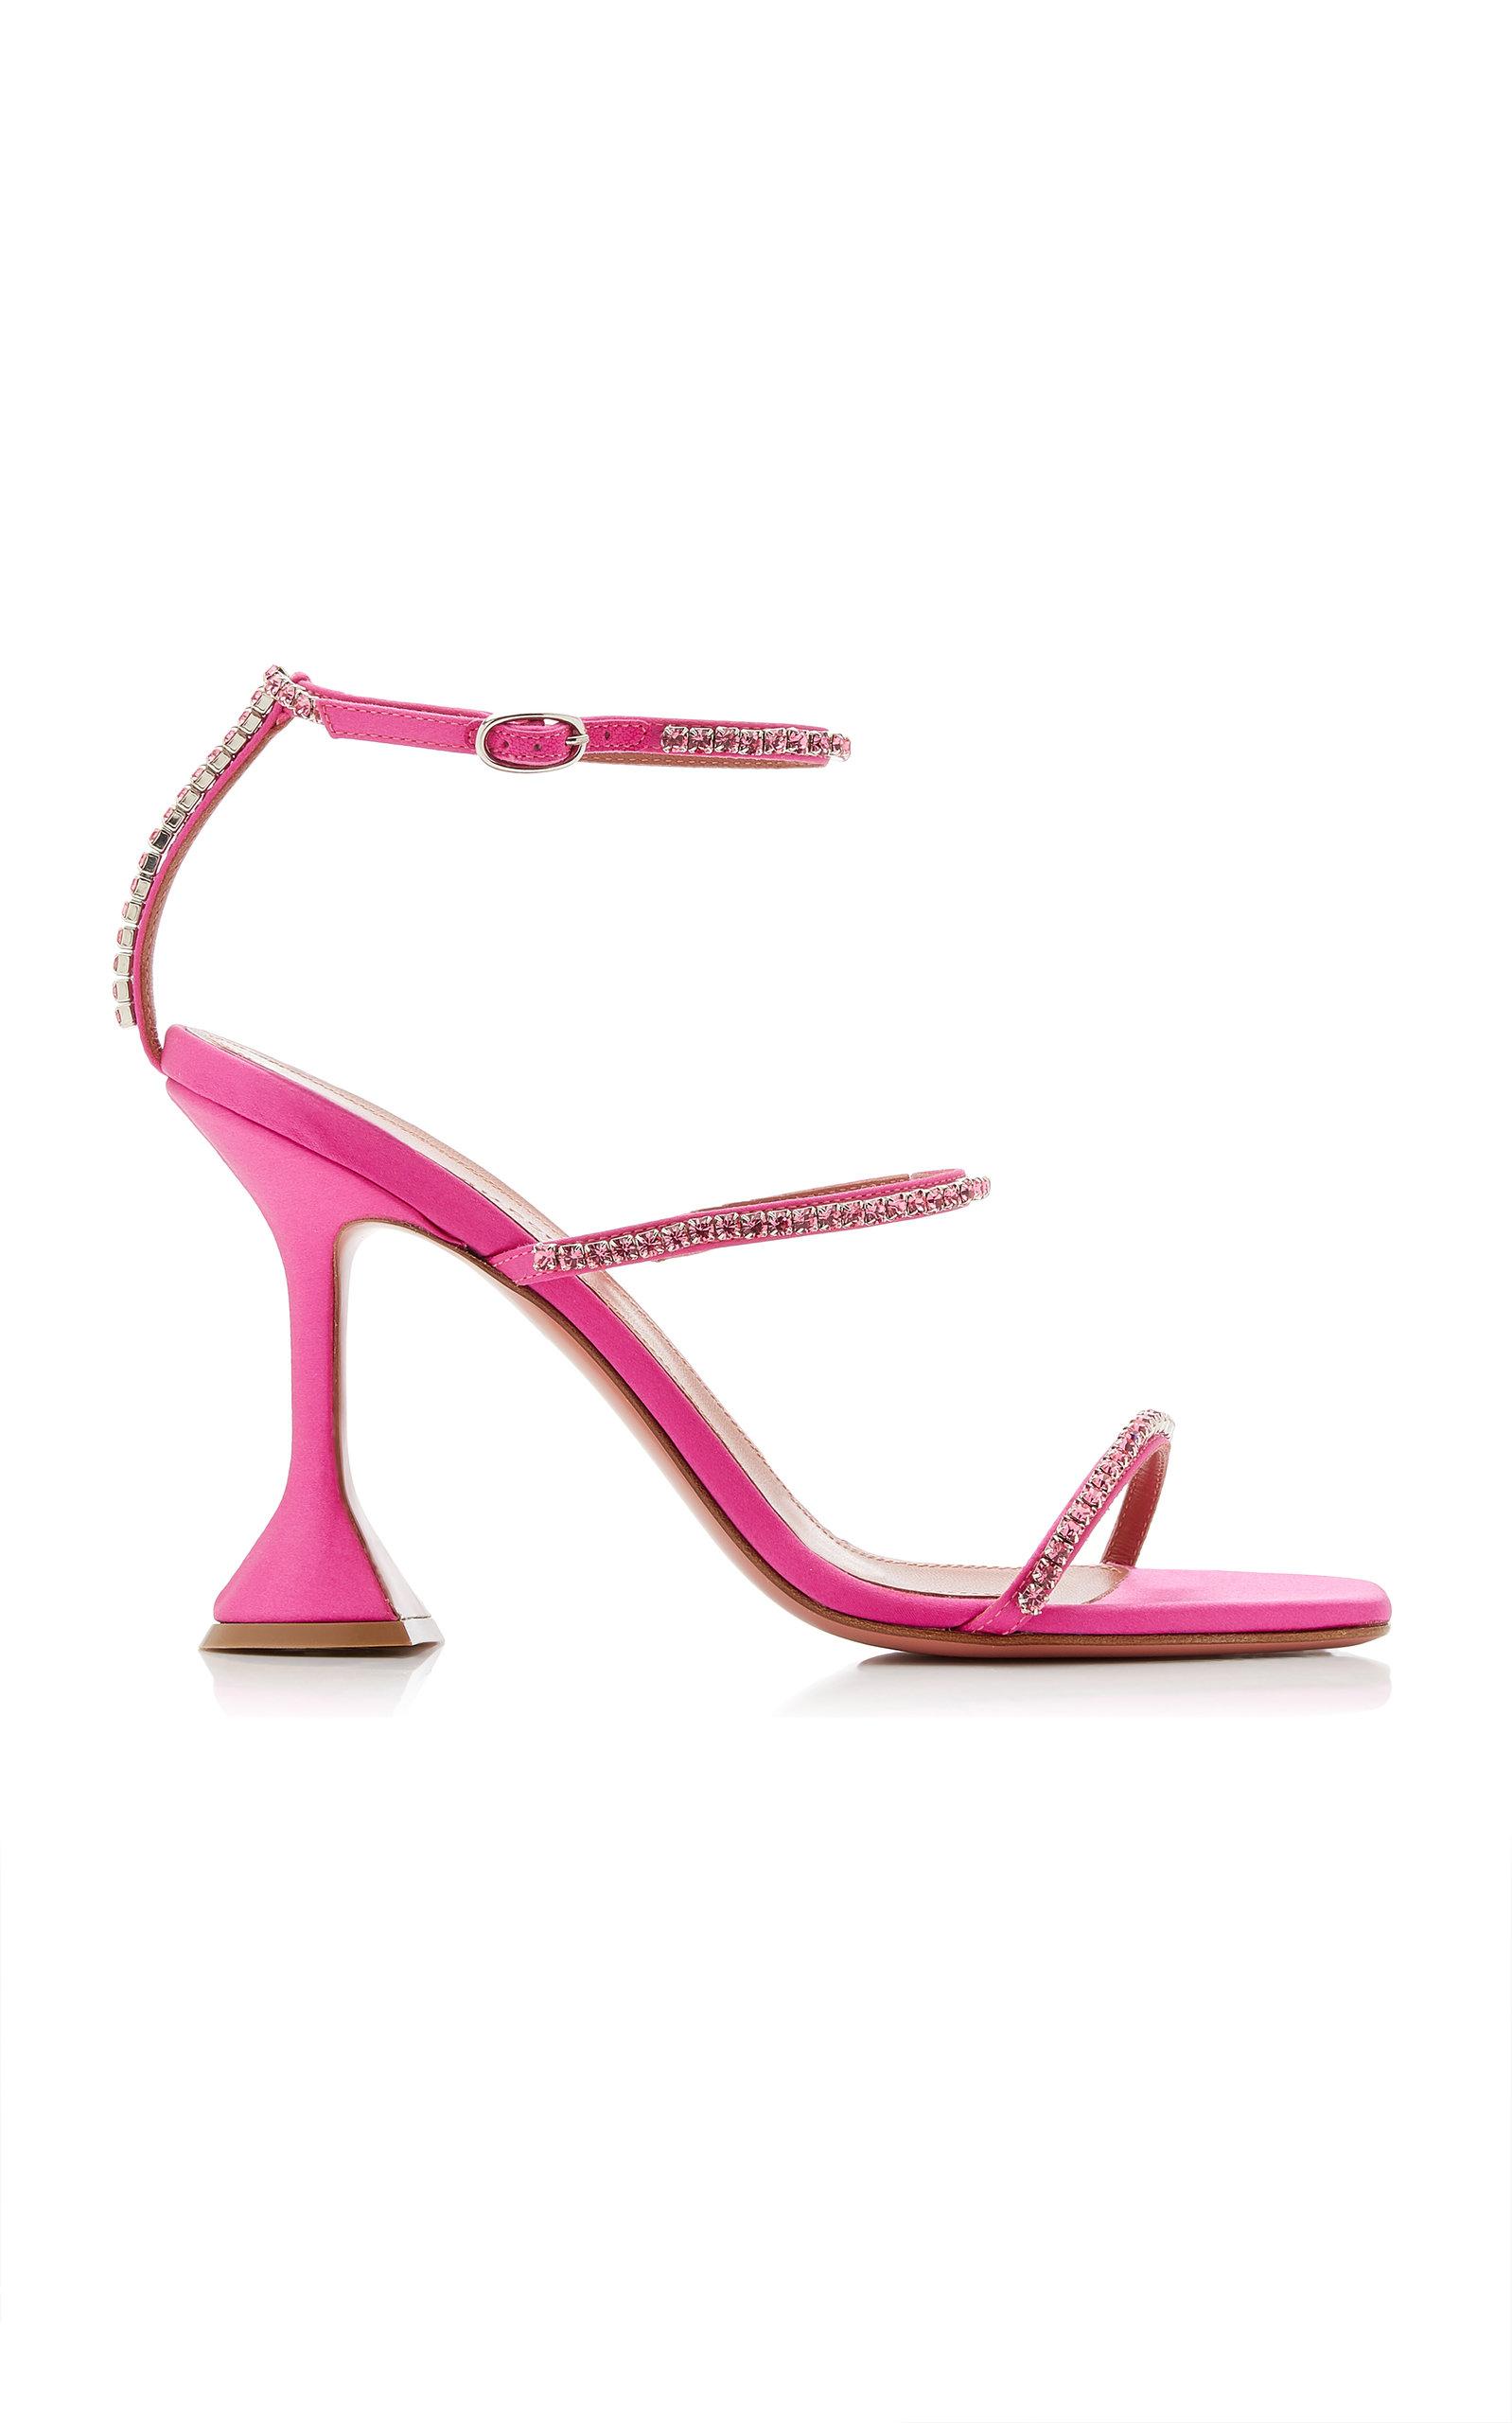 Amina Muaddi – Women's Gilda Crystal-Embellished Satin Sandals – Pink – Moda Operandi